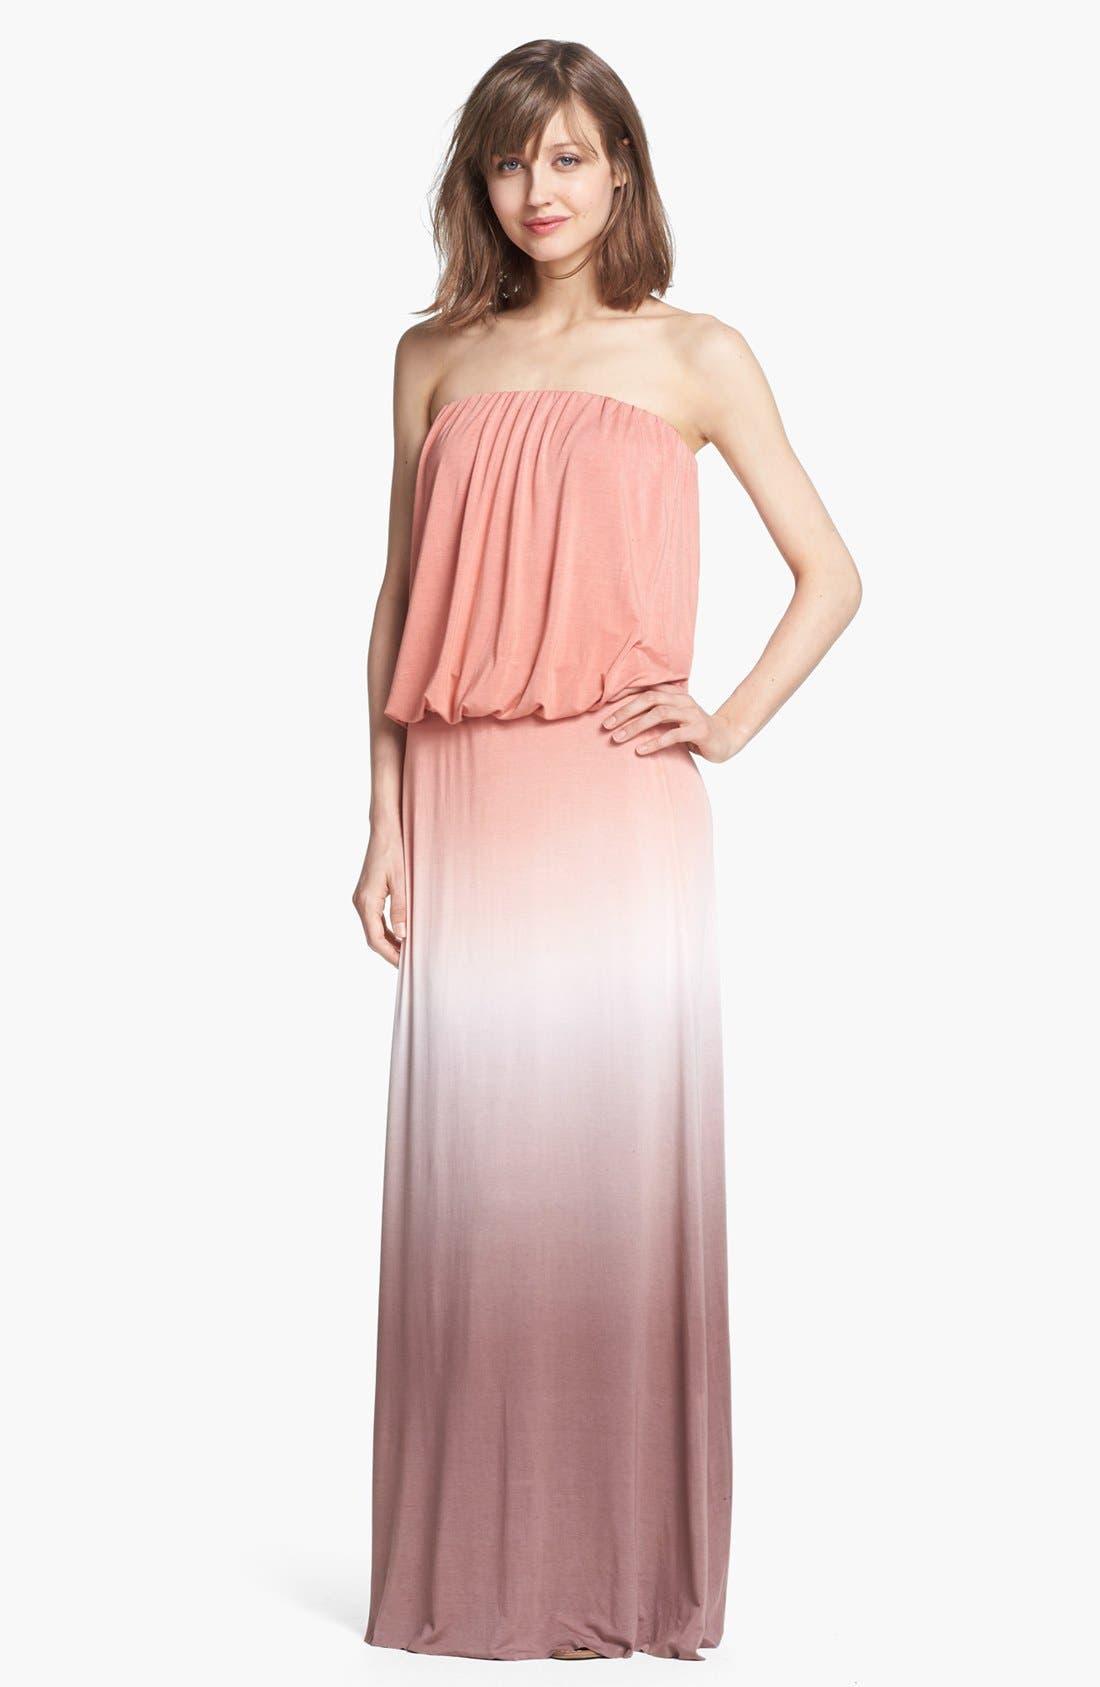 Alternate Image 1 Selected - Young, Fabulous & Broke 'Sydney' Ombré Maxi Dress